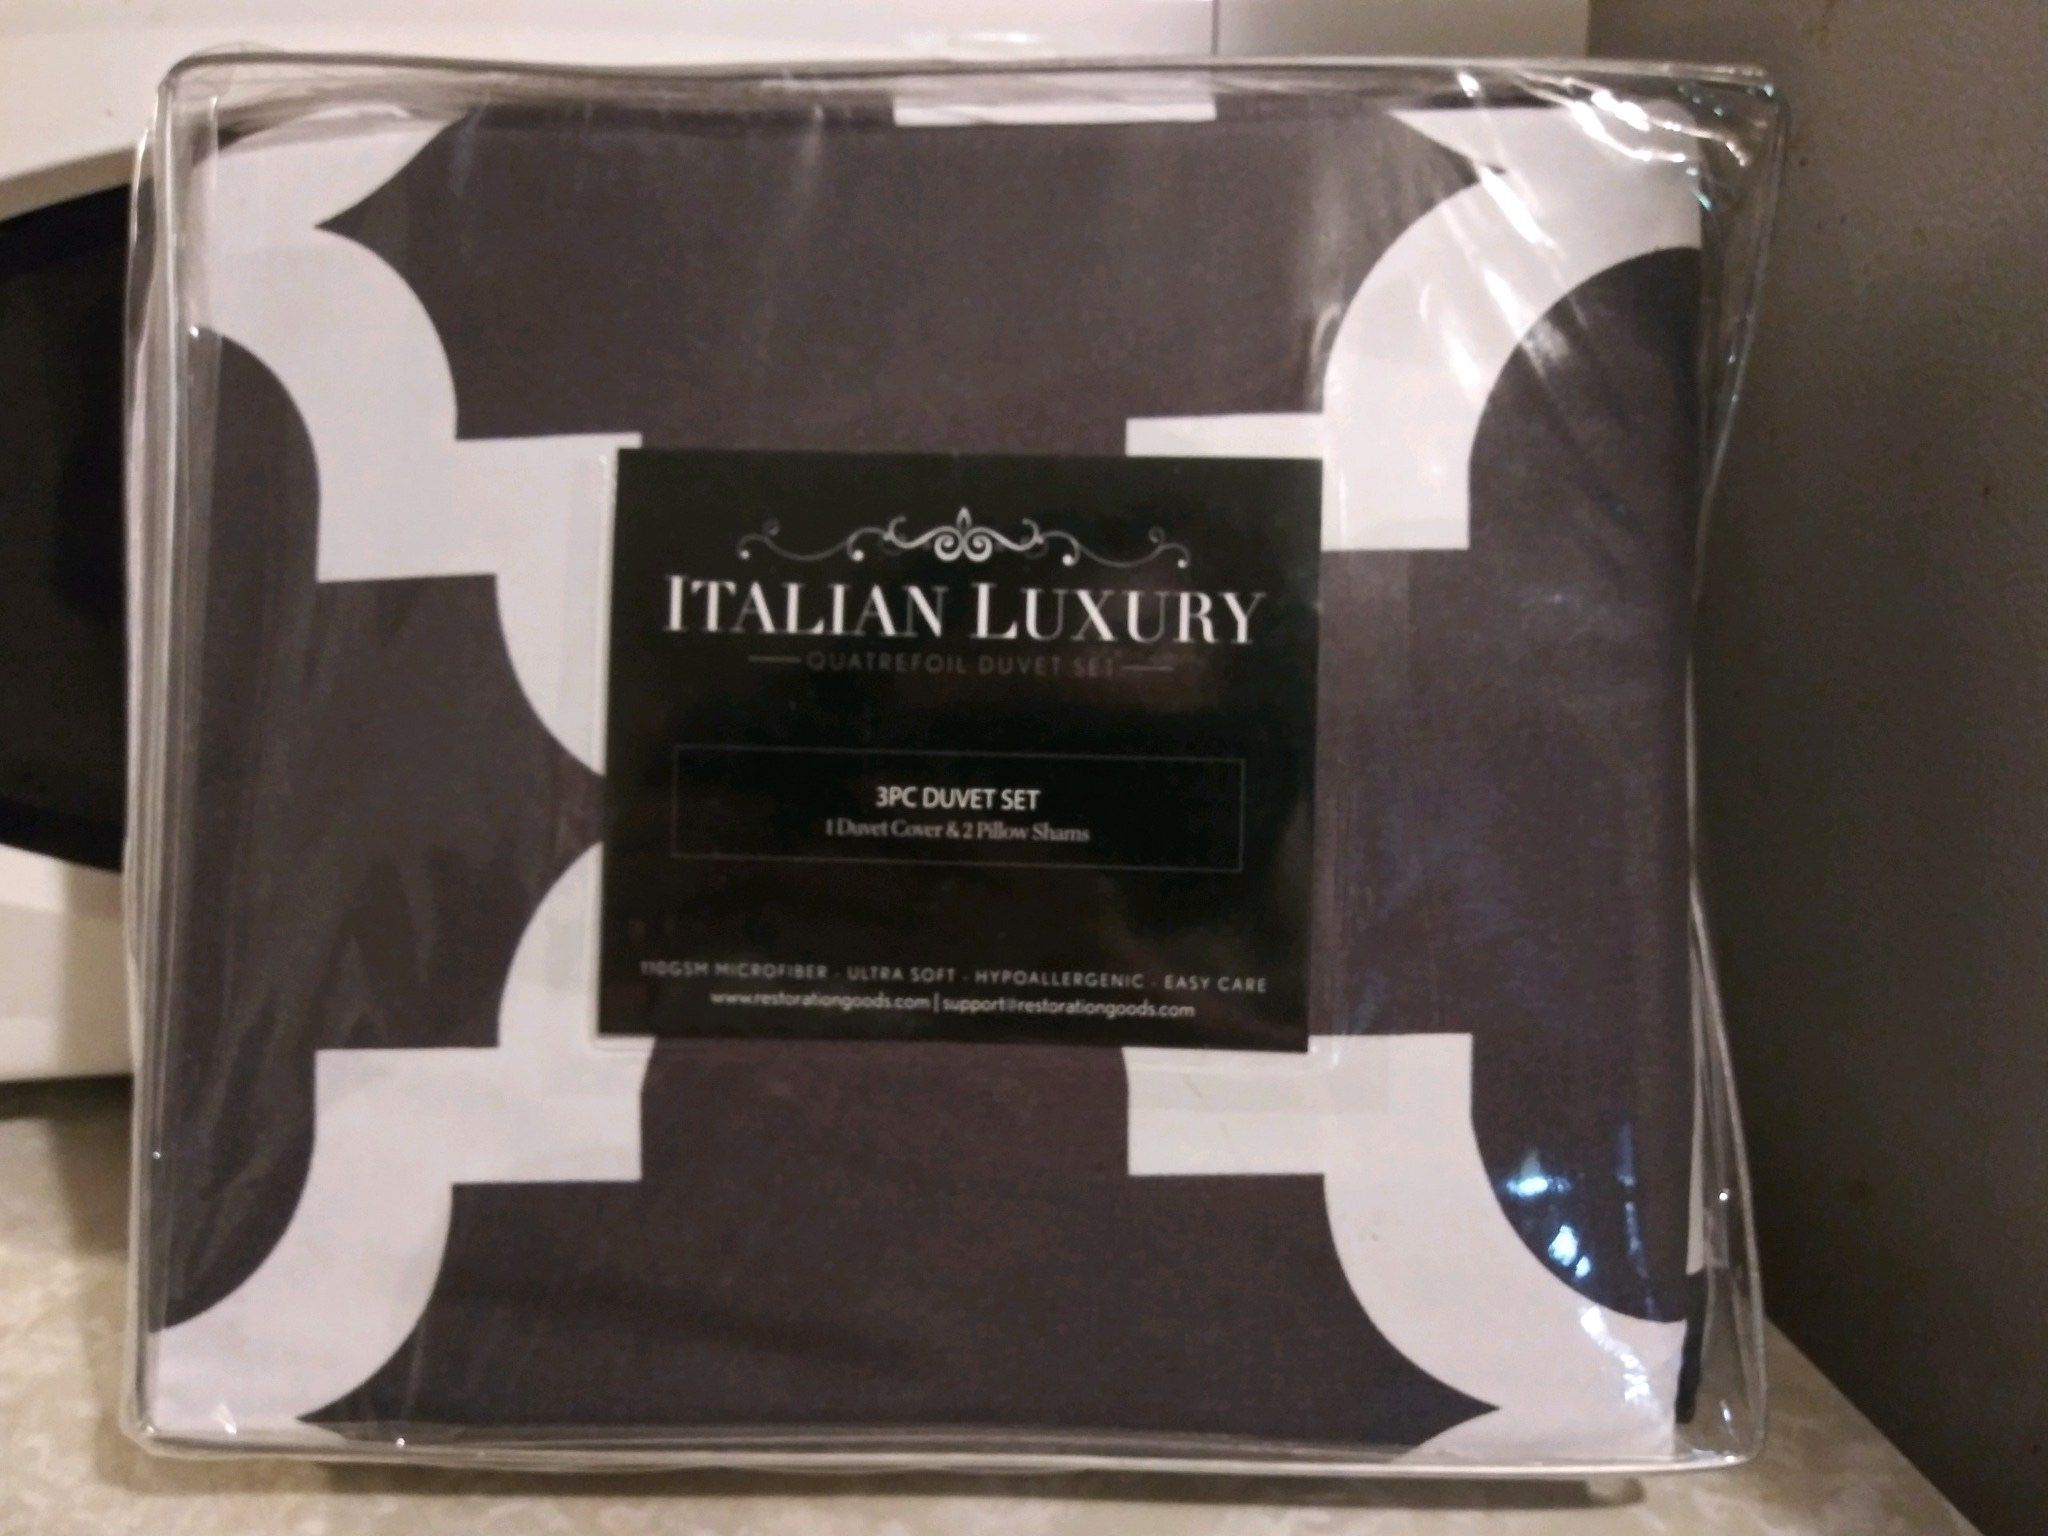 Full/Queen 1 duvet cover and 2 pillow shams